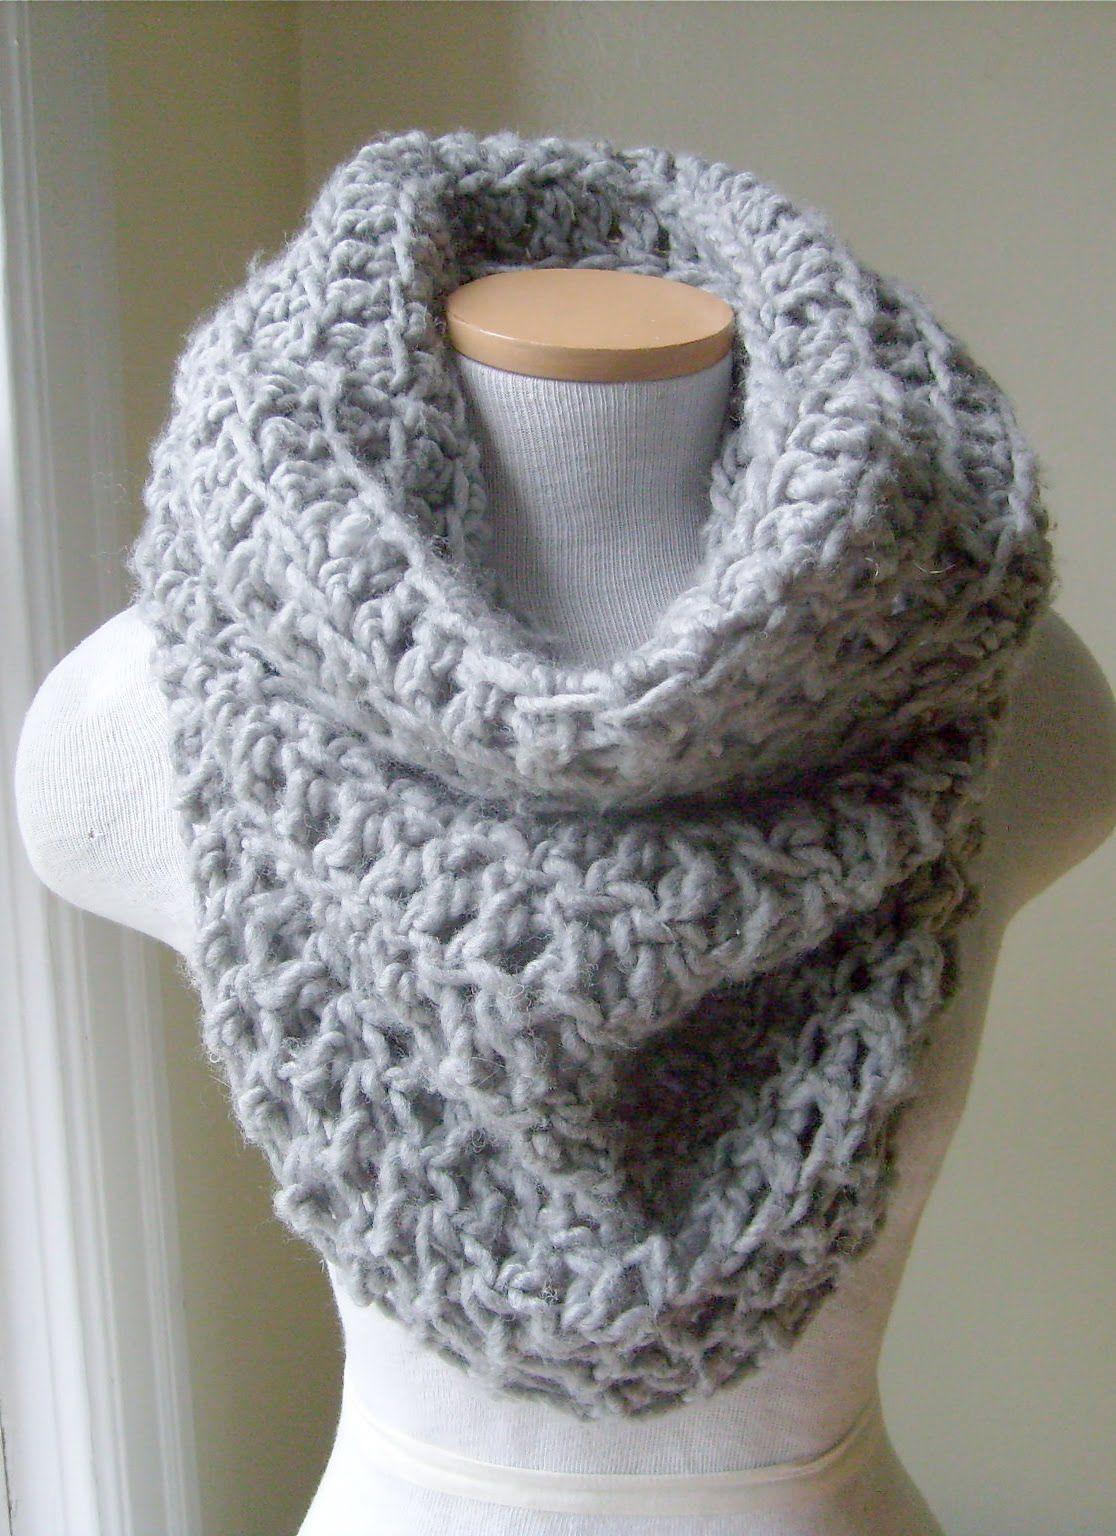 Knitting Cowl Scarf : Crochet cowl pattern crocheted neckwarmers